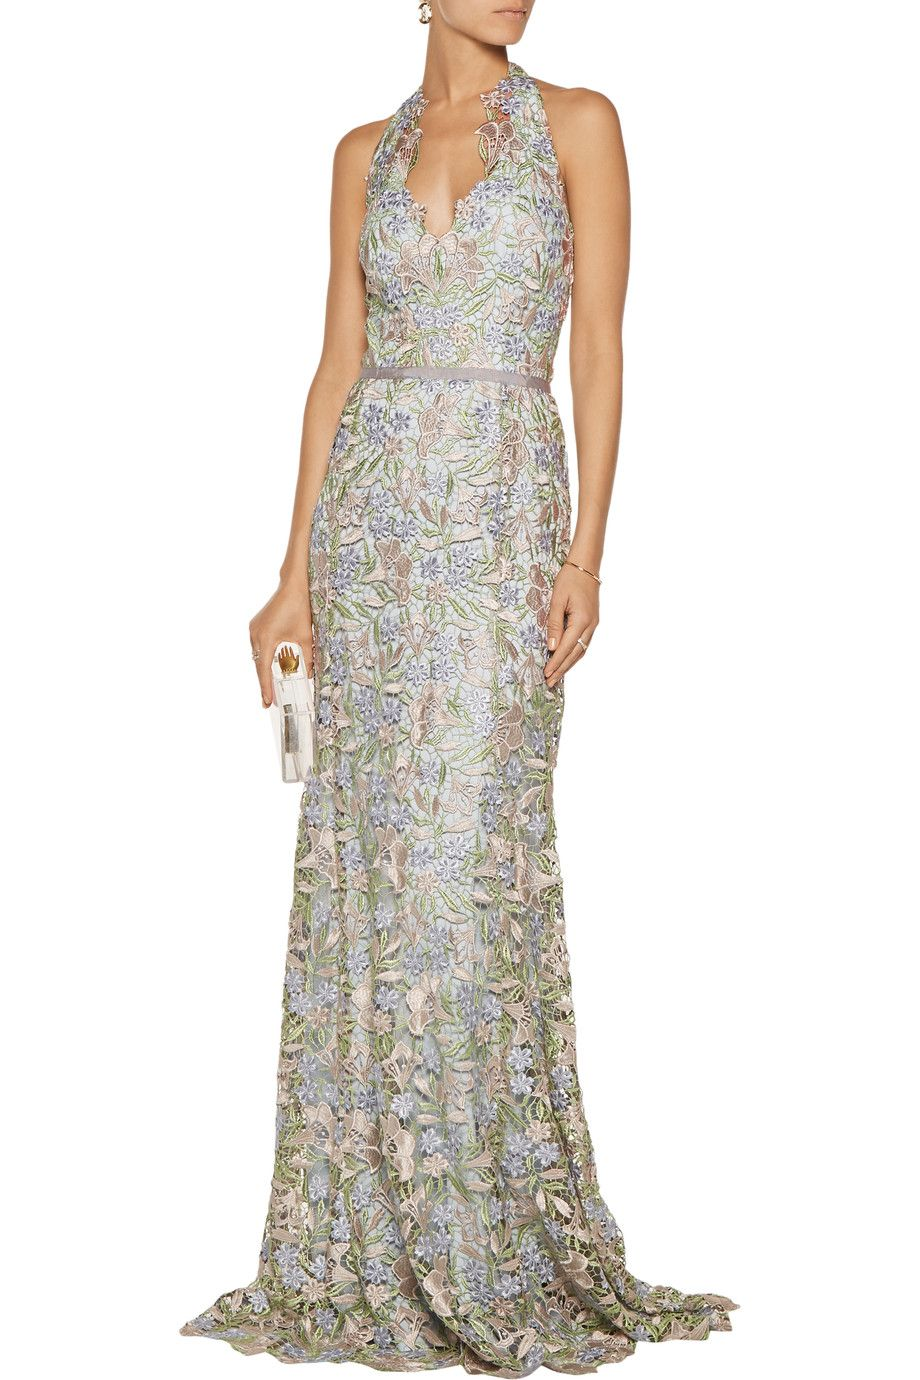 Shop On Sale Marchesa Notte Lace Halterneck Gown Browse Other